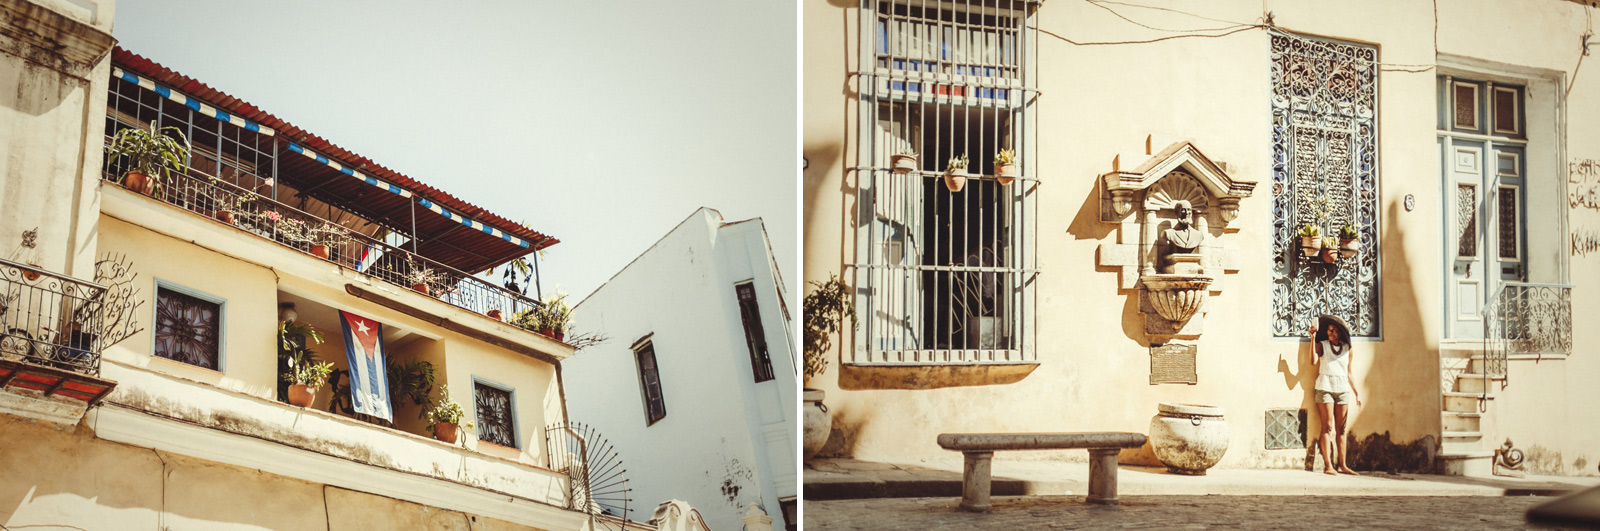 Havana travel 2018 59